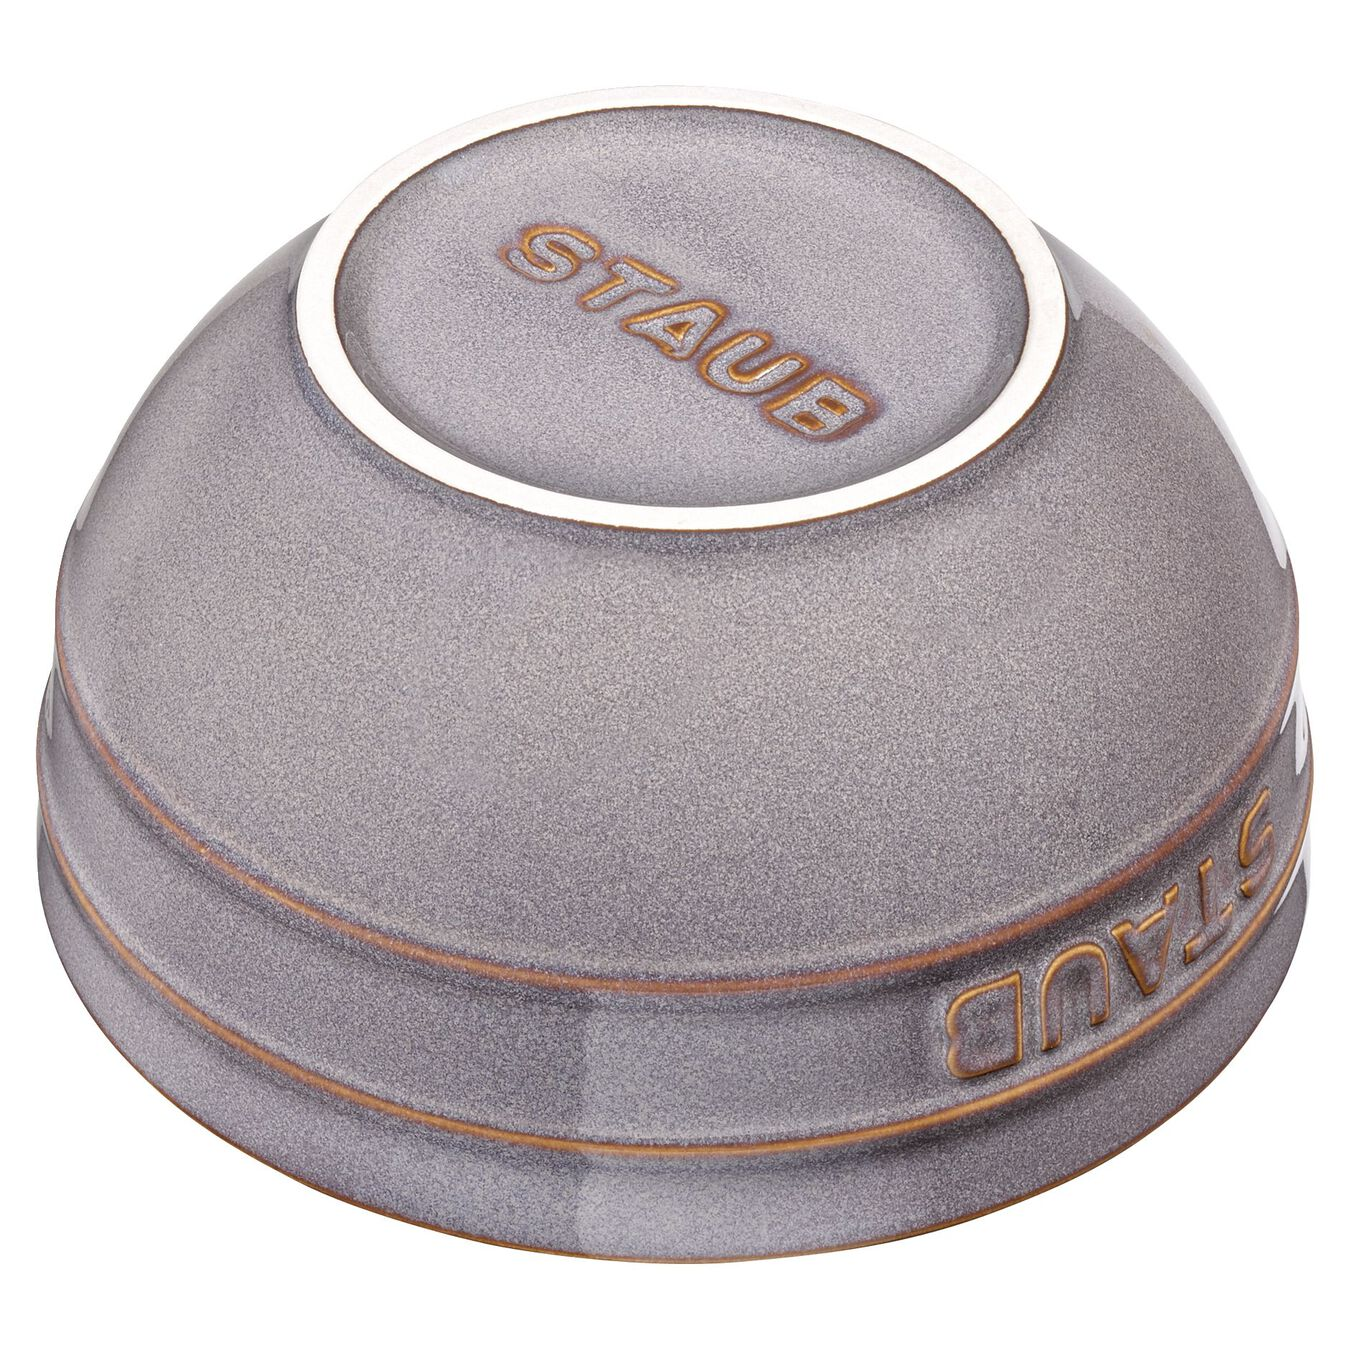 14 cm Ceramic round Bol, Ancient-Grey,,large 2